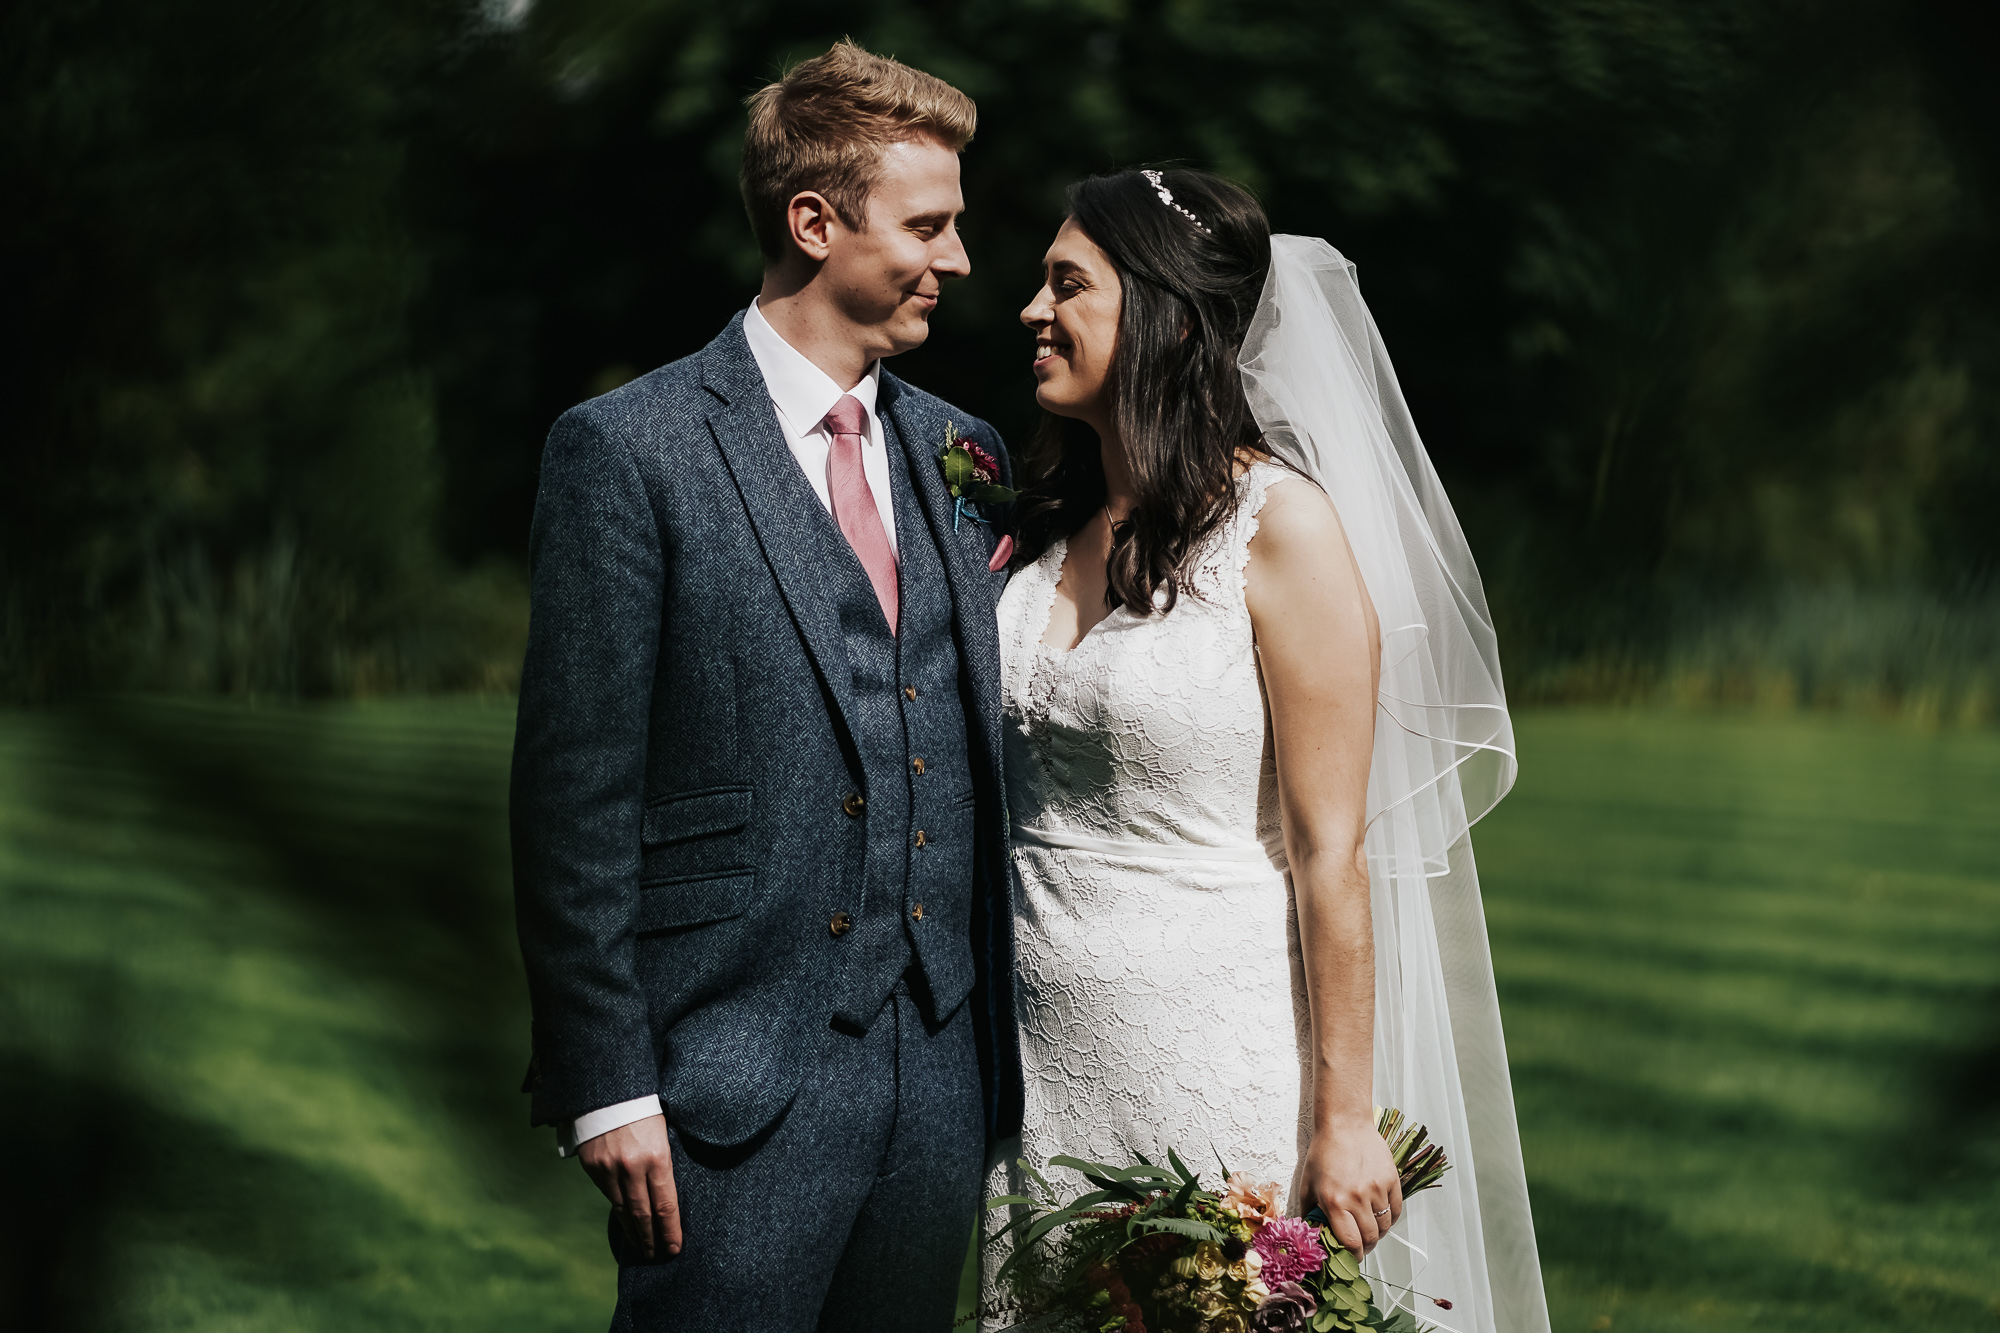 Oak tree of peover wedding photography cheshire wedding photographer (36 of 56).jpg